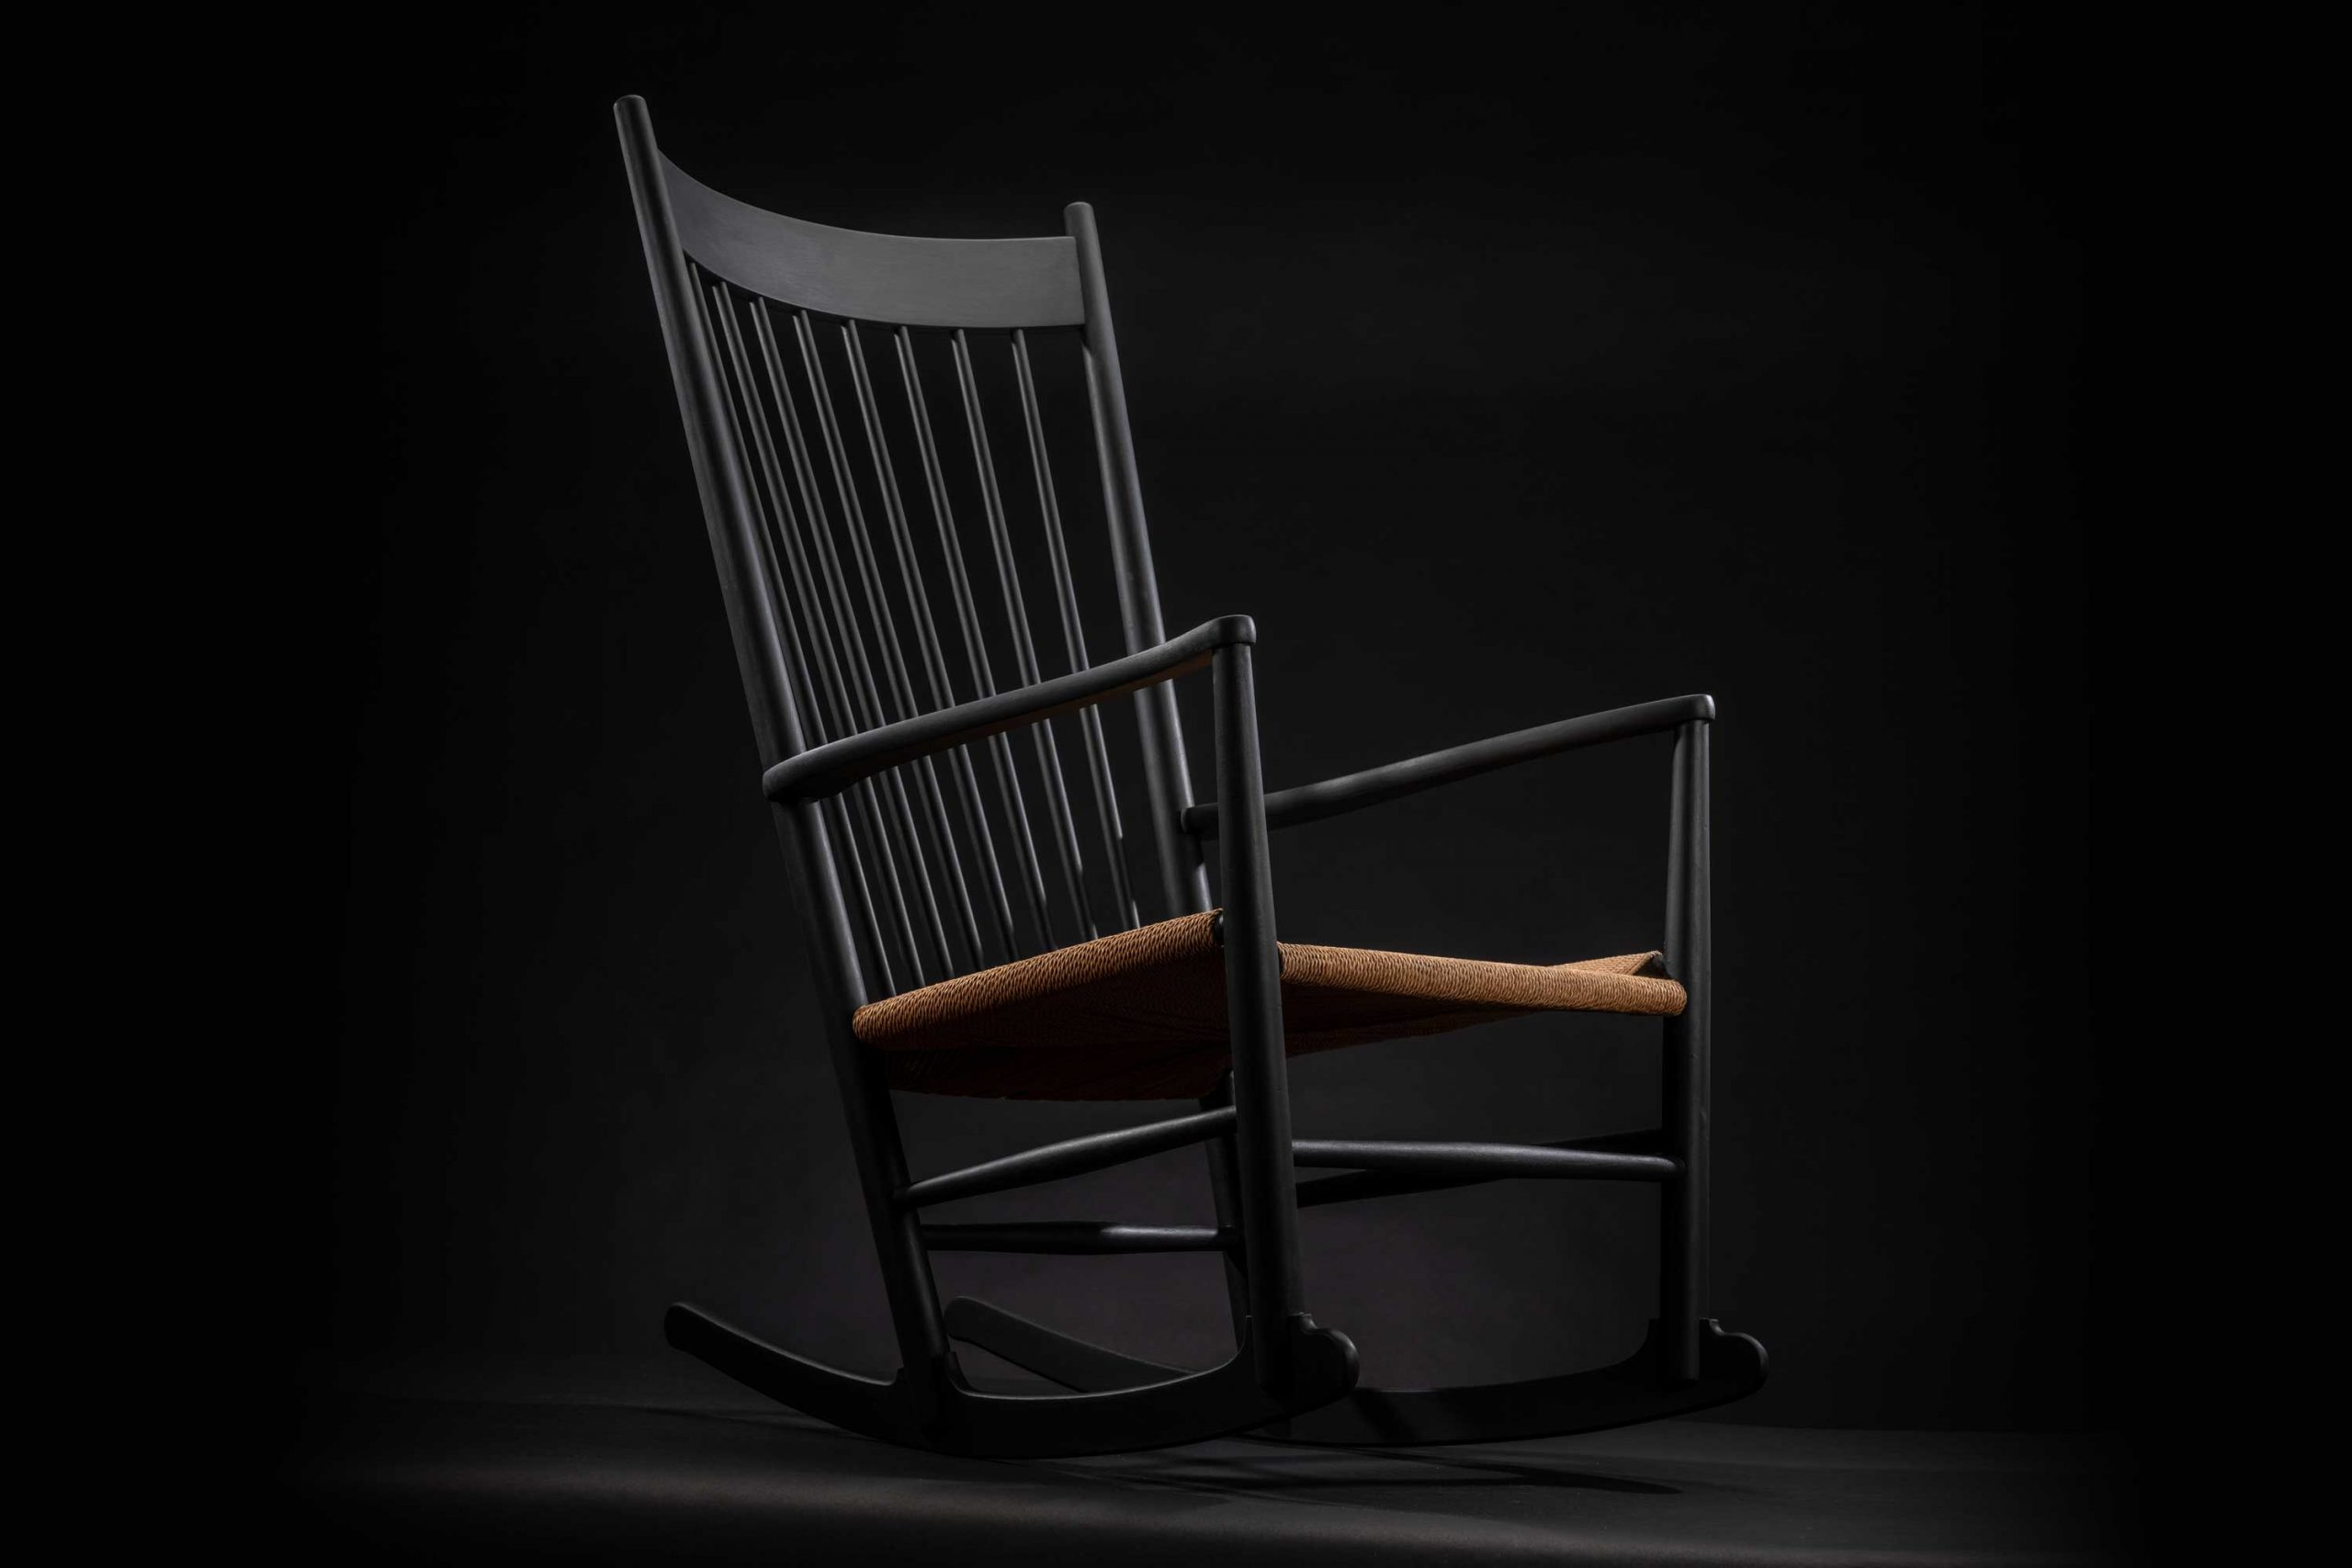 Hans Wegner Rocking Chair Black Edition 1965